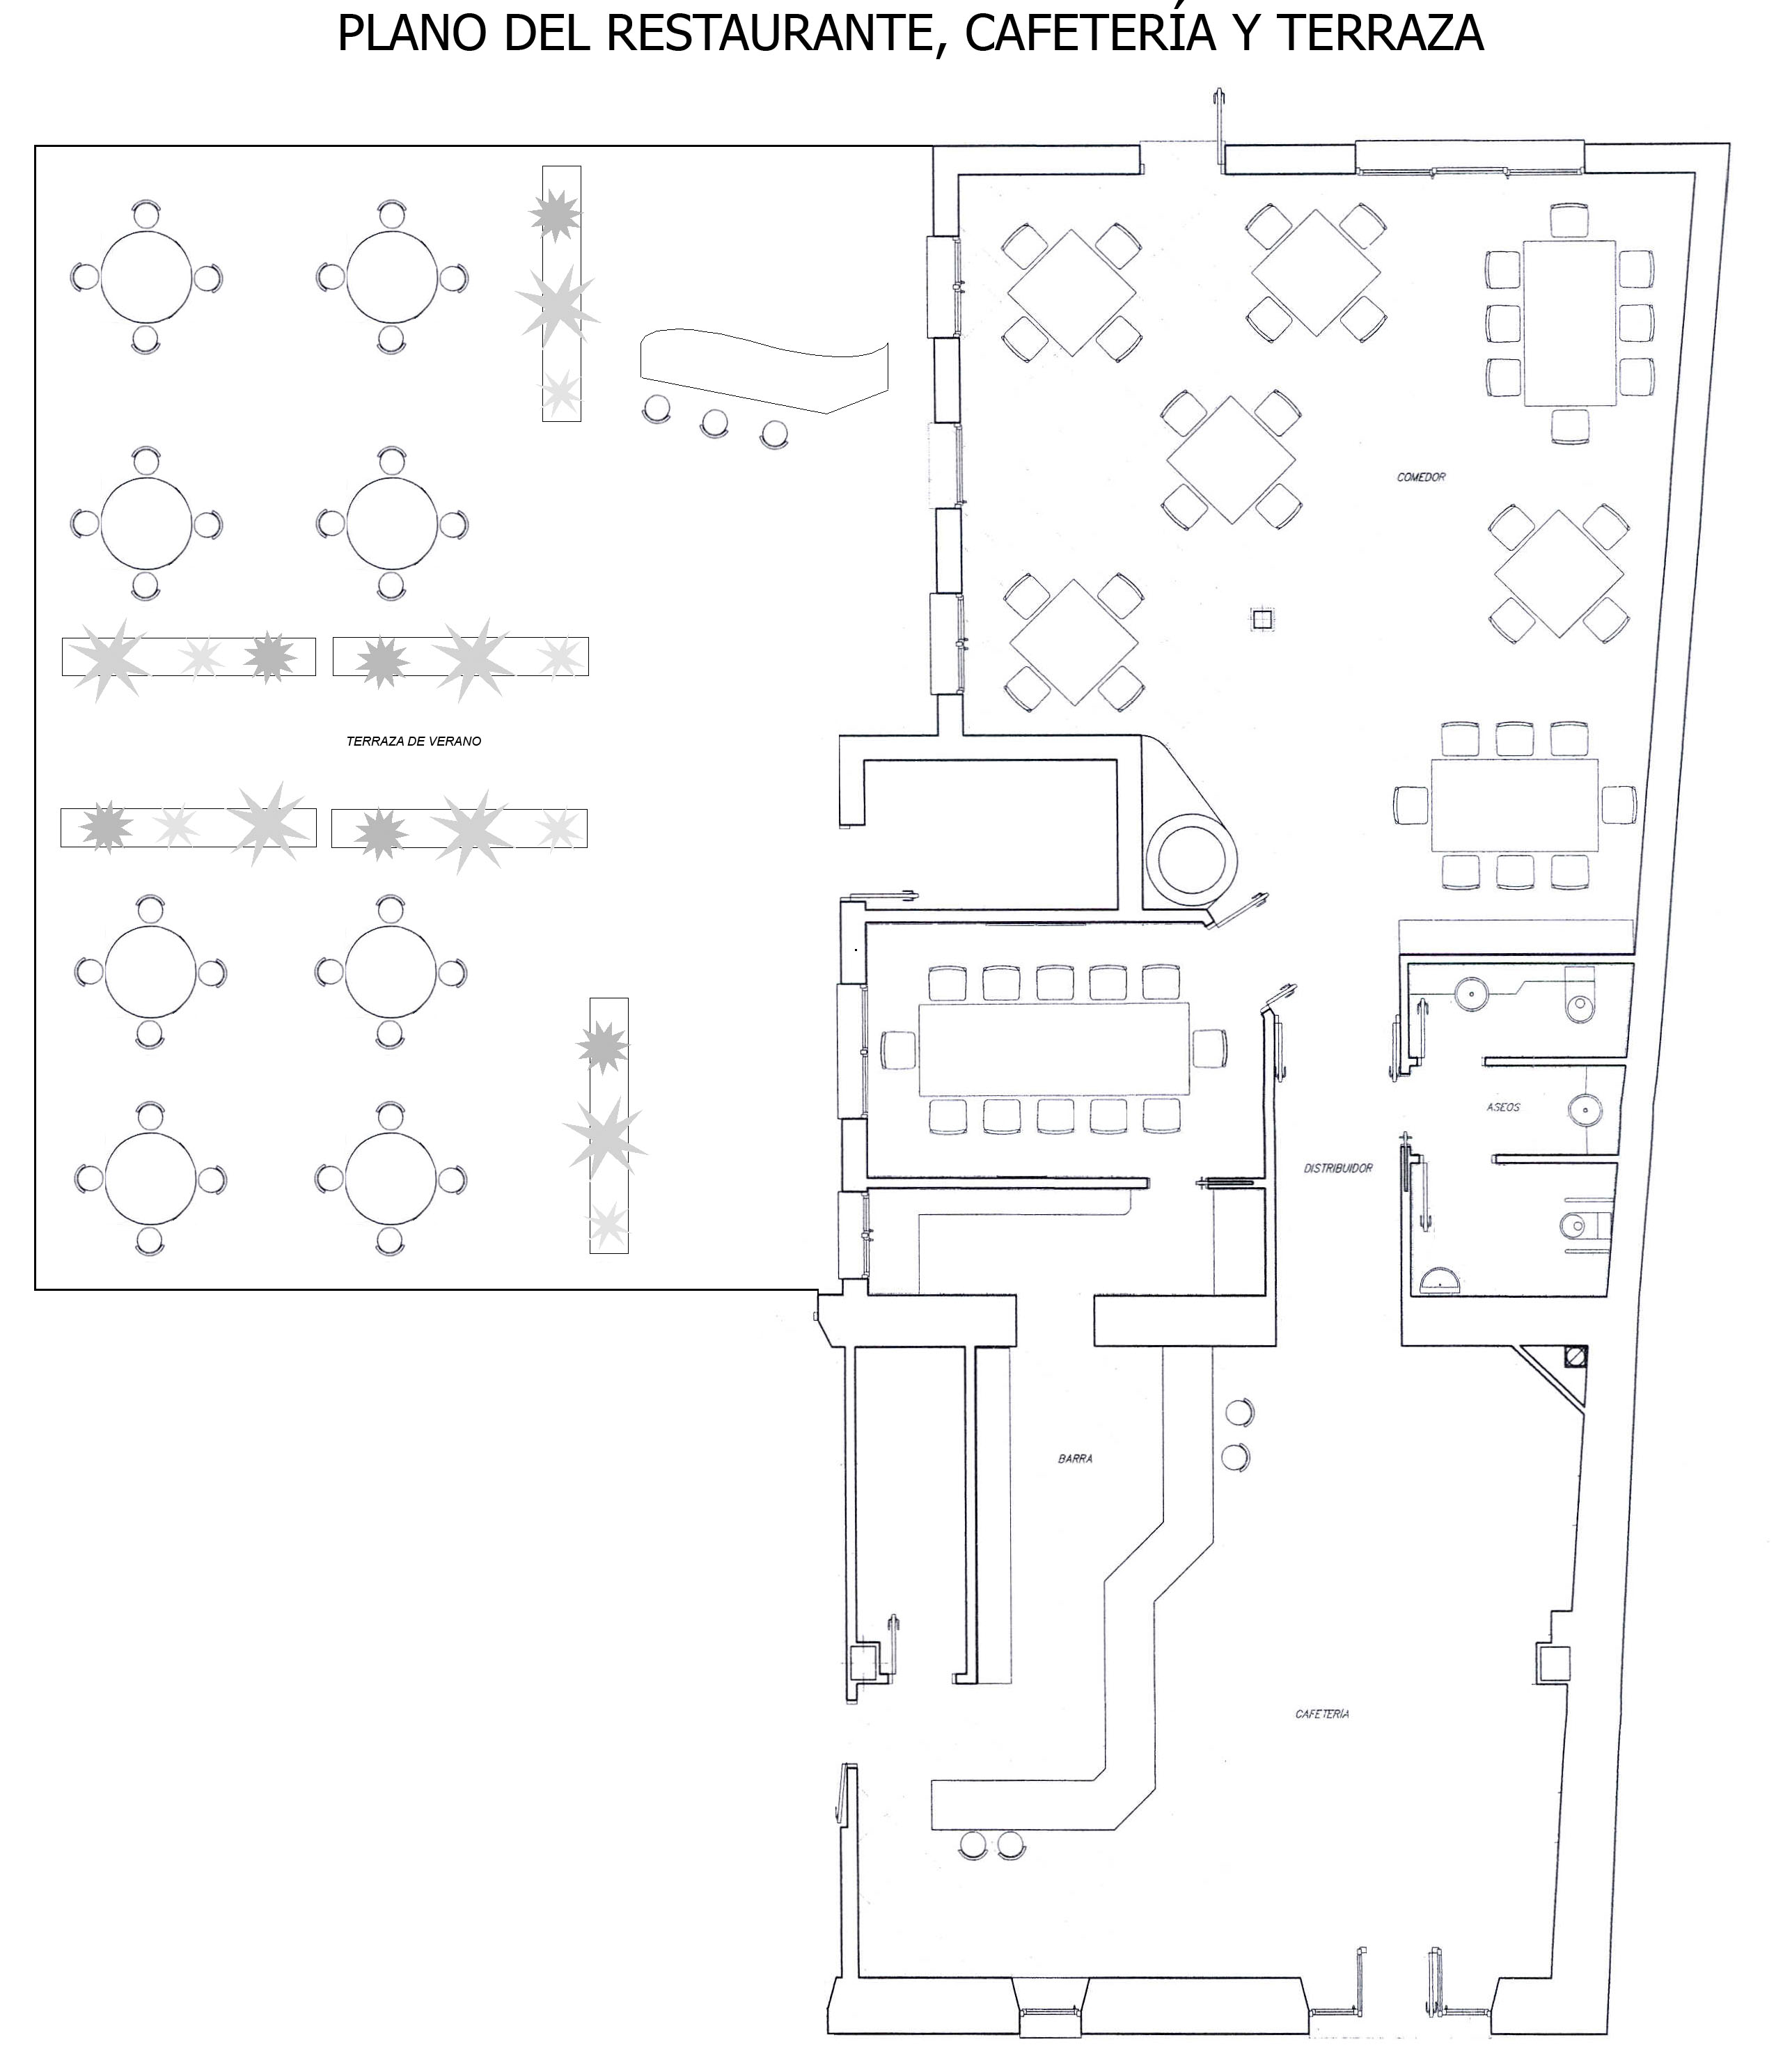 Apartamentos el duende de carricuende restaurante for Plano restaurante